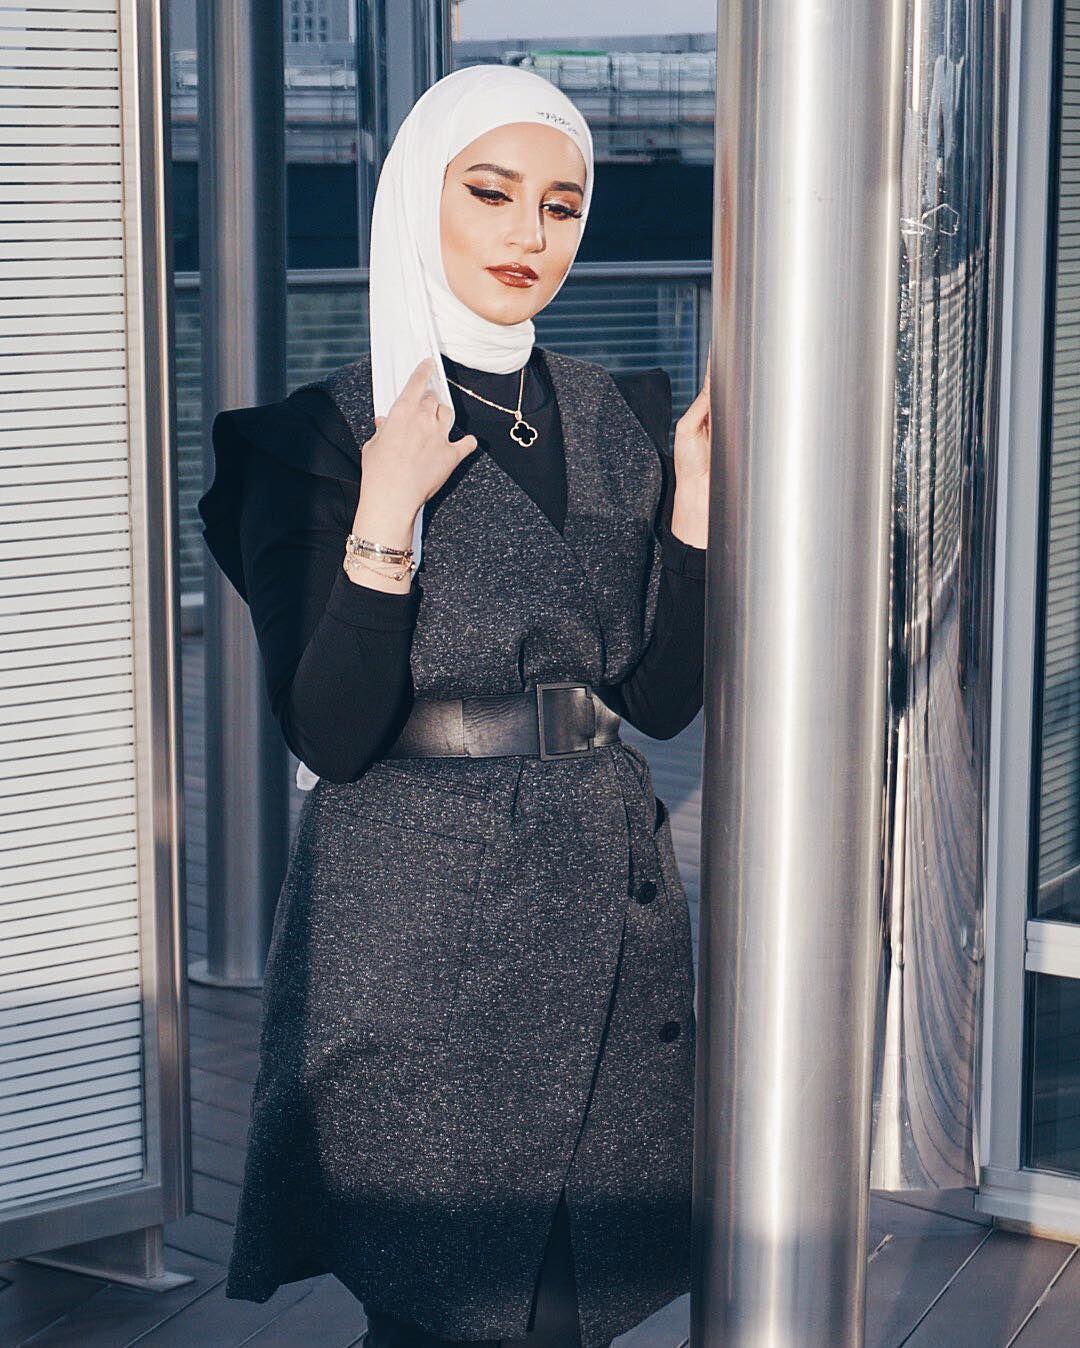 Pin By Asiah On Muslimah Fashion & Hijab Style(Niqab